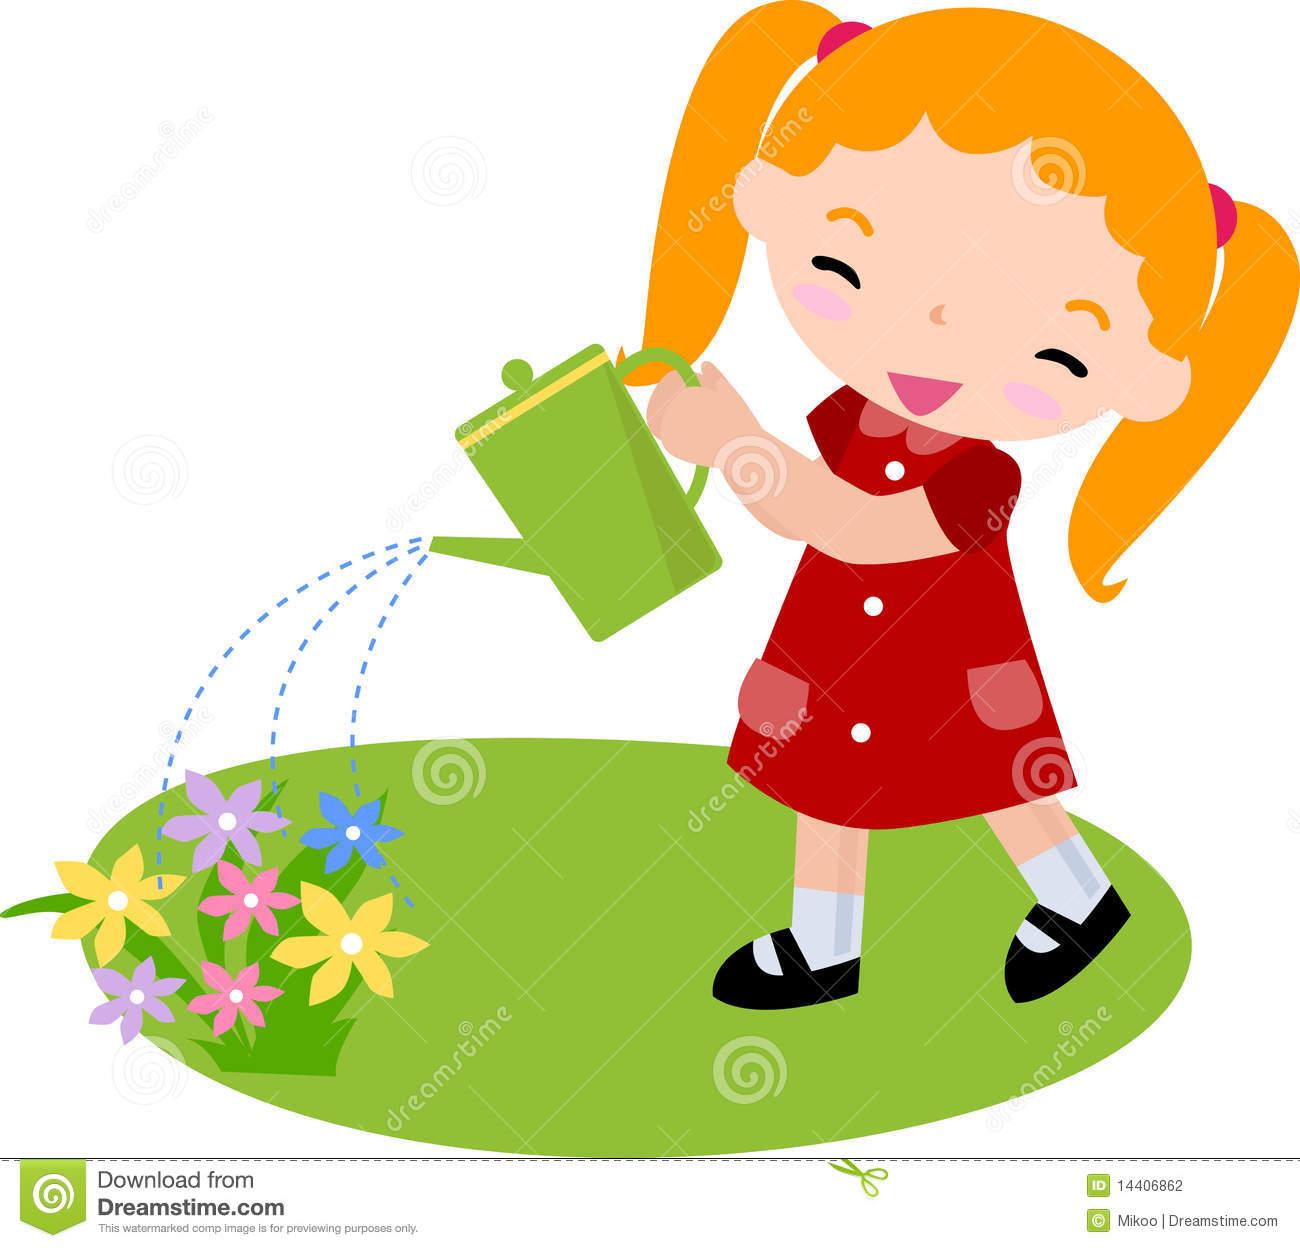 Watering gems clipart download Girl watering plants clipart 1 » Clipart Station download